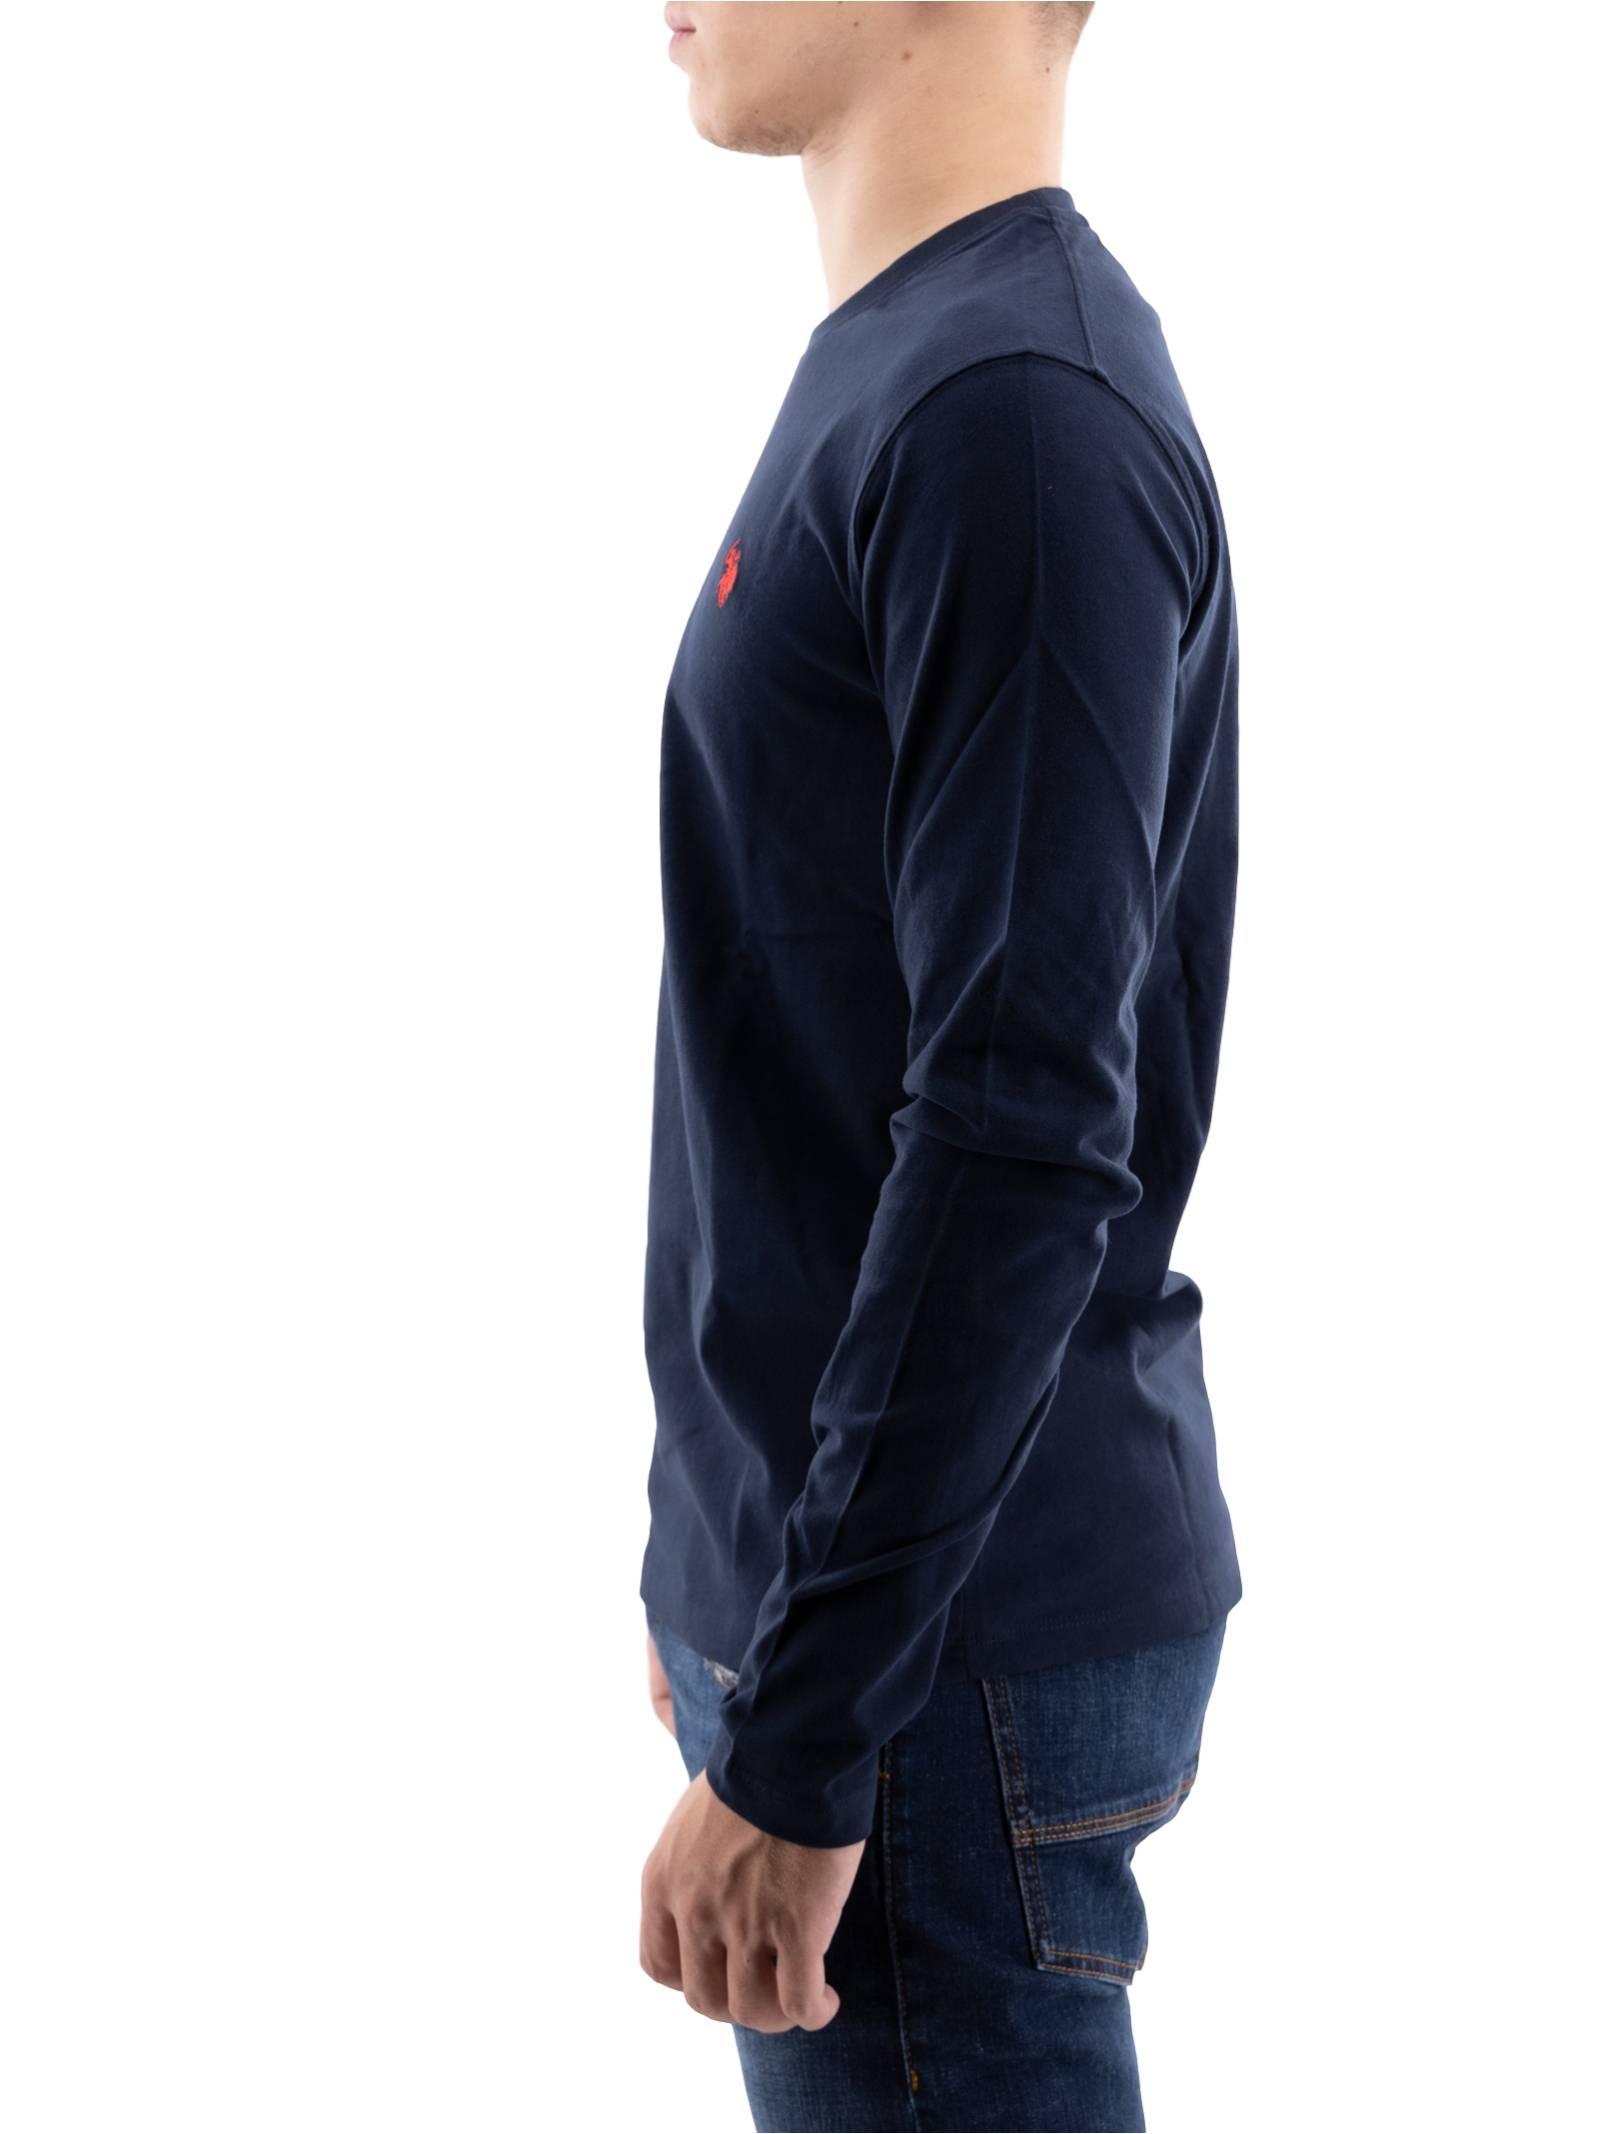 U.S. Polo Assin. T-shirt 59260 34502